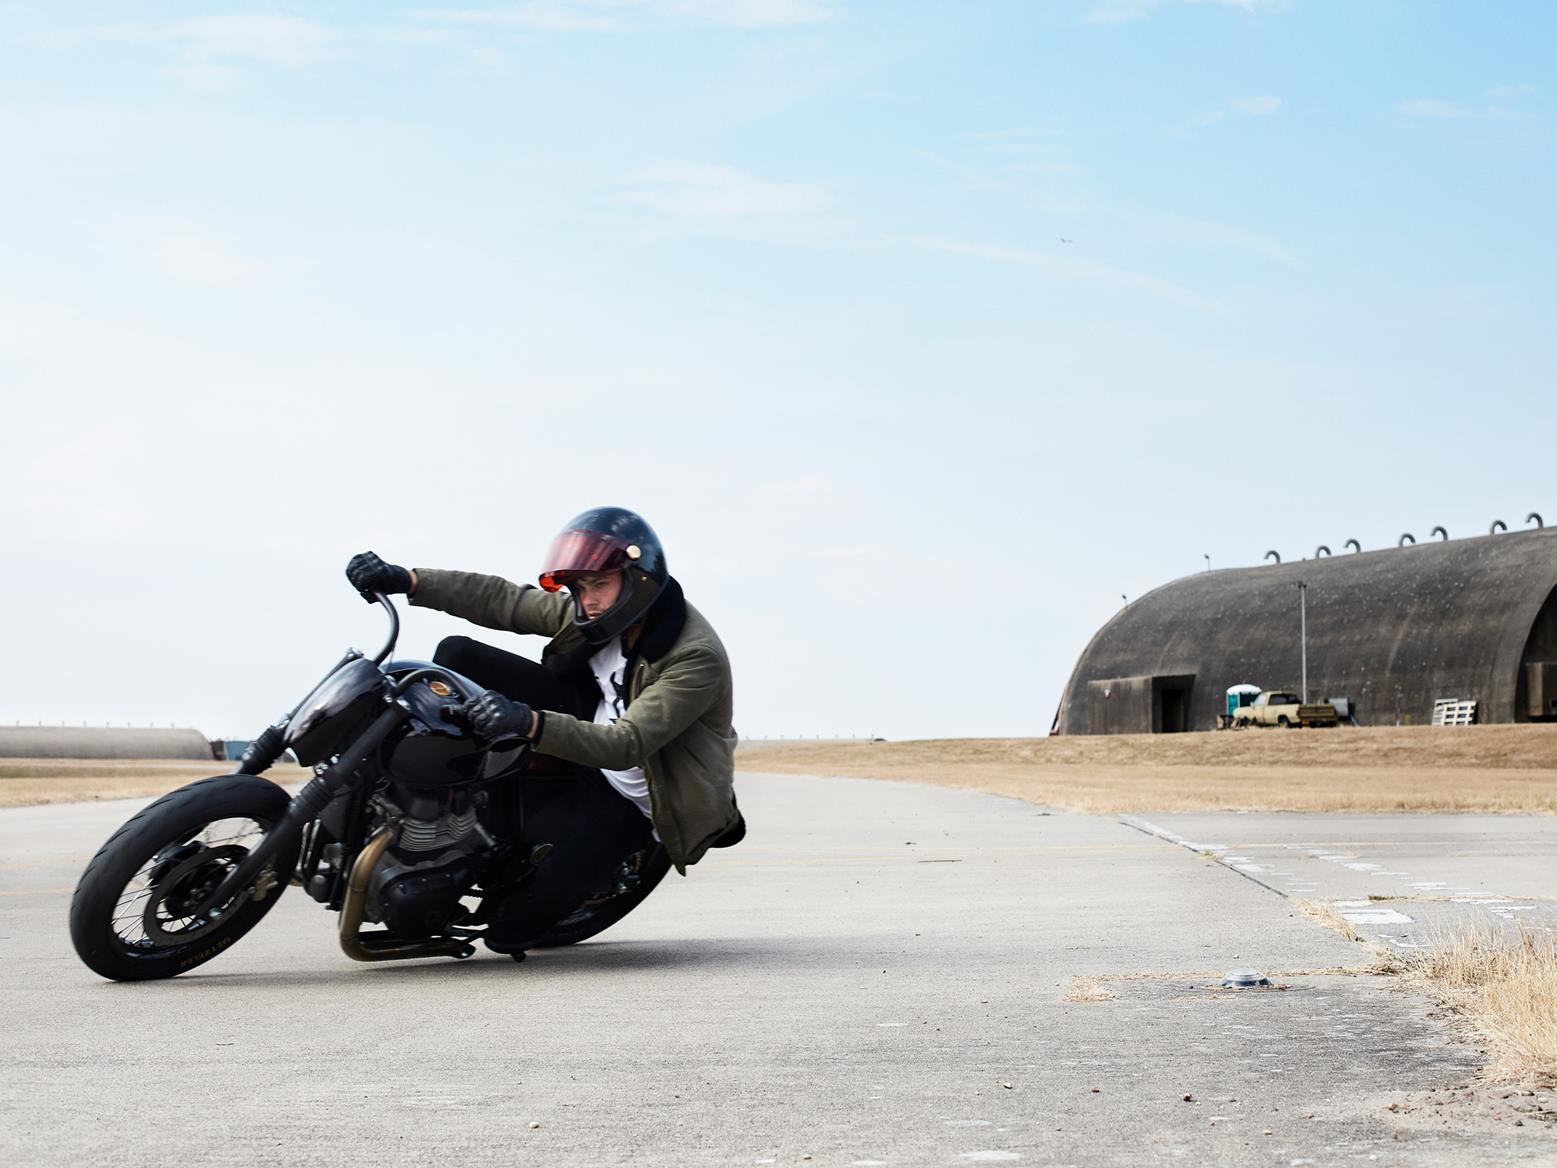 Old Empire Motorcycles custom Royal Enfield Interceptor 650 twin cornering shot